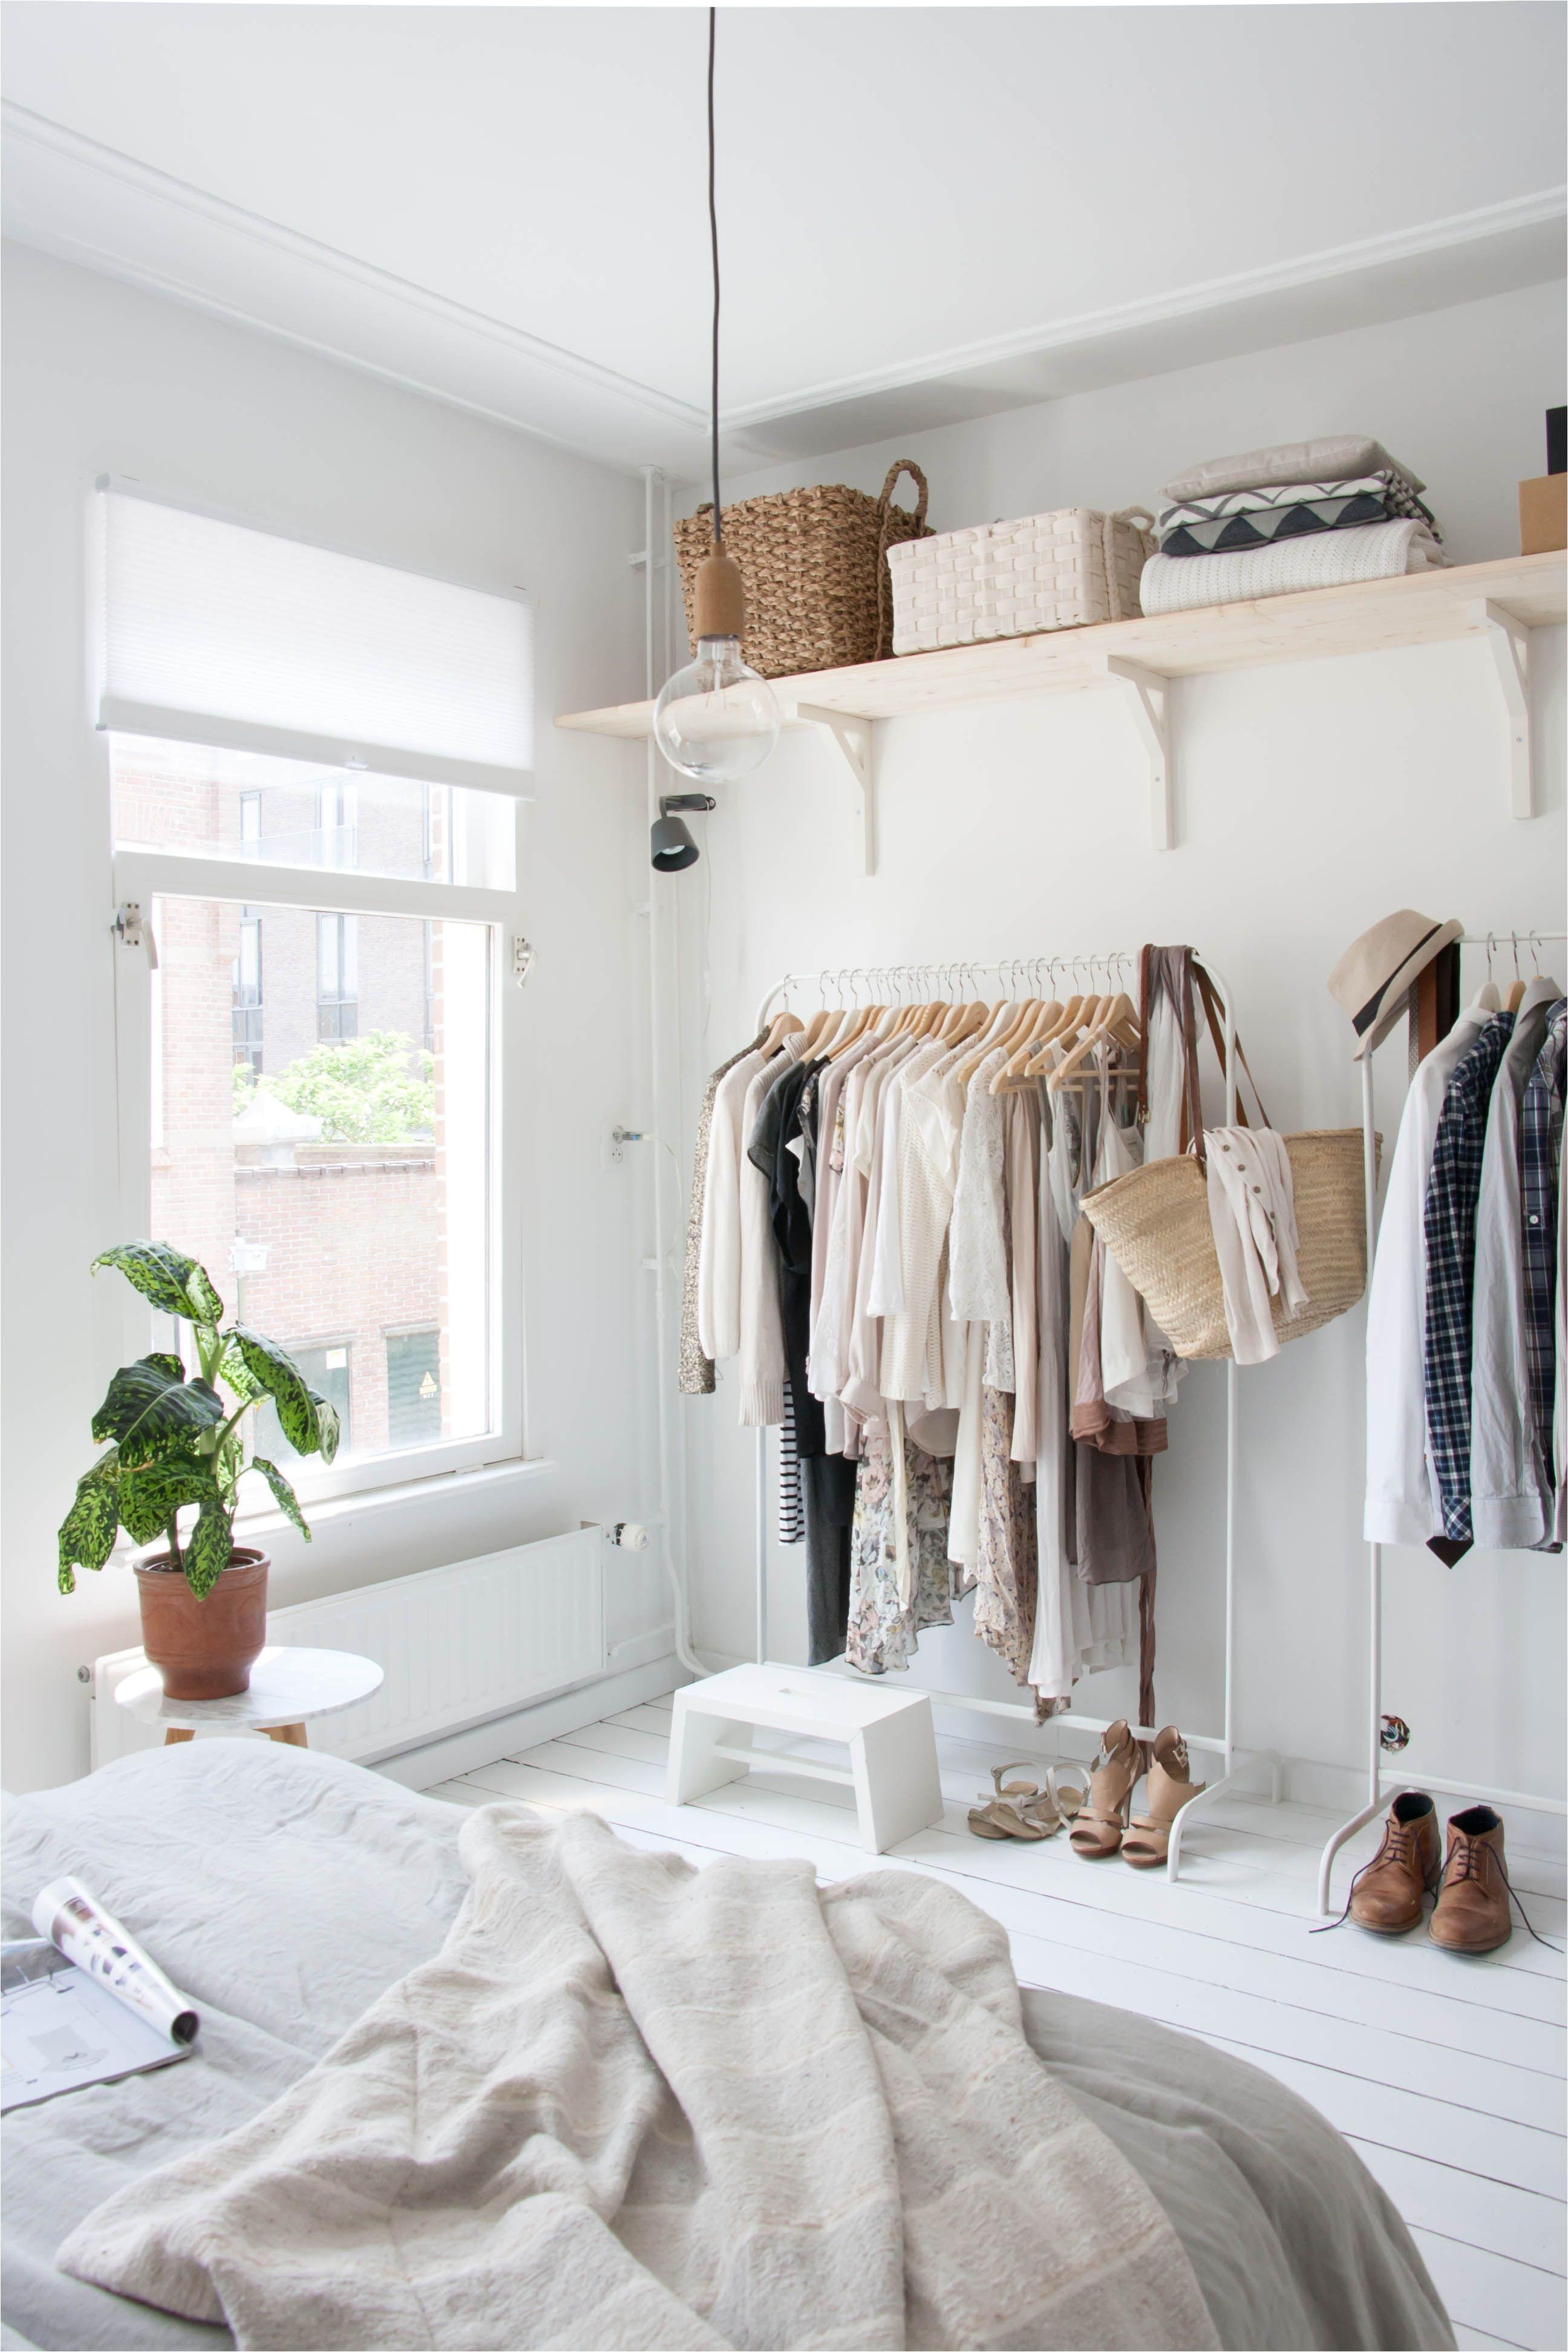 bedroom ideas marvelous industrial garment rack open wardrobe rack hanging clothes rack temporary clothes rack